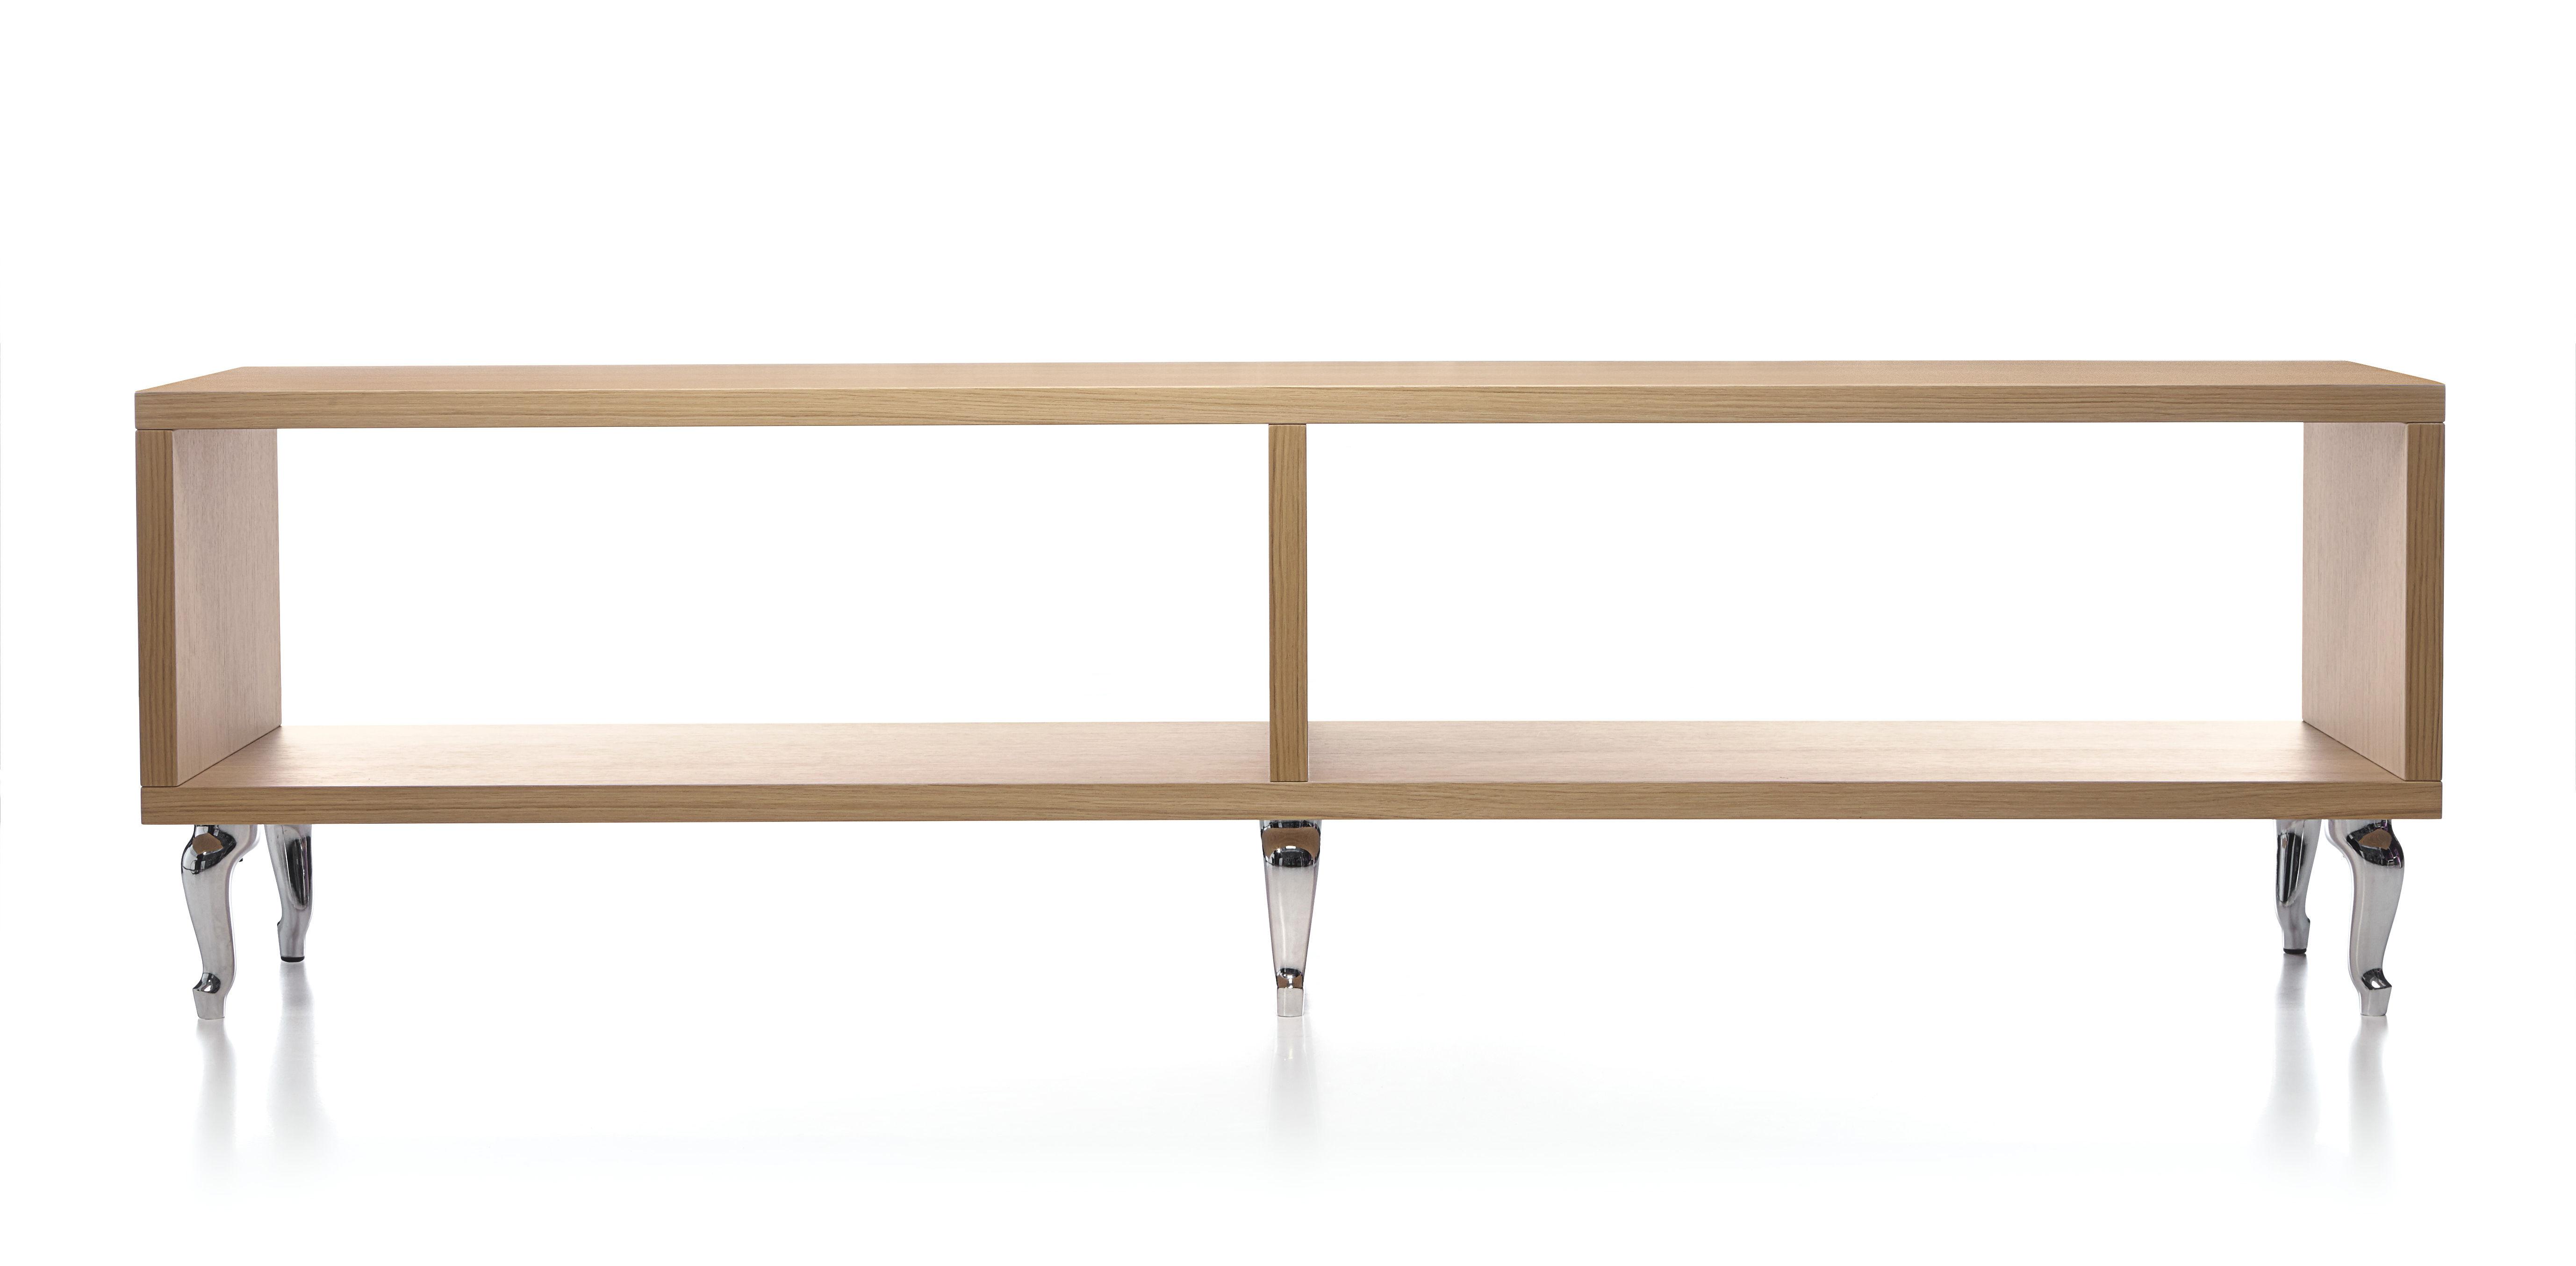 etag re bassotti basse l 180 x h 52 cm ch ne blanchi. Black Bedroom Furniture Sets. Home Design Ideas